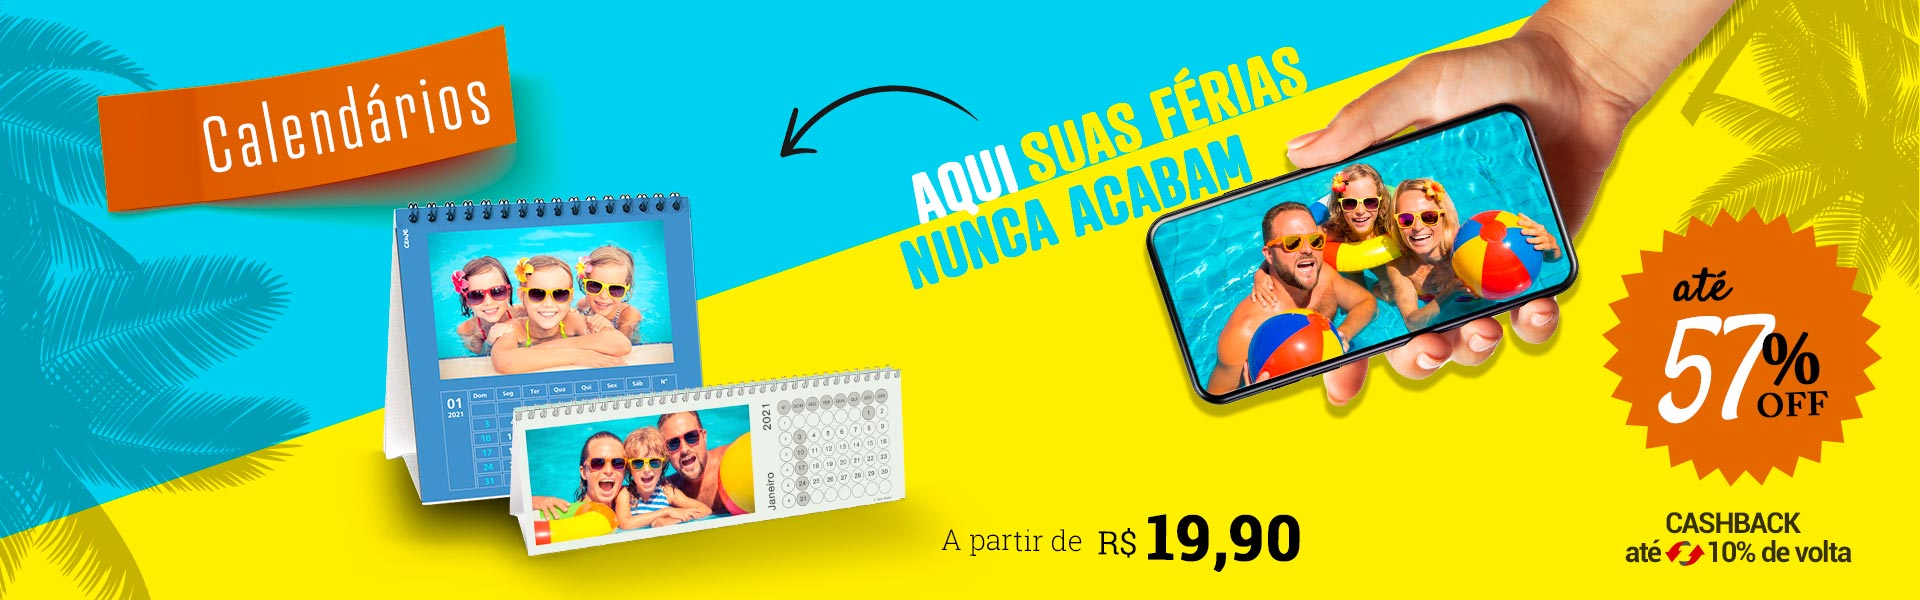 Calendários - Phooto Brasil